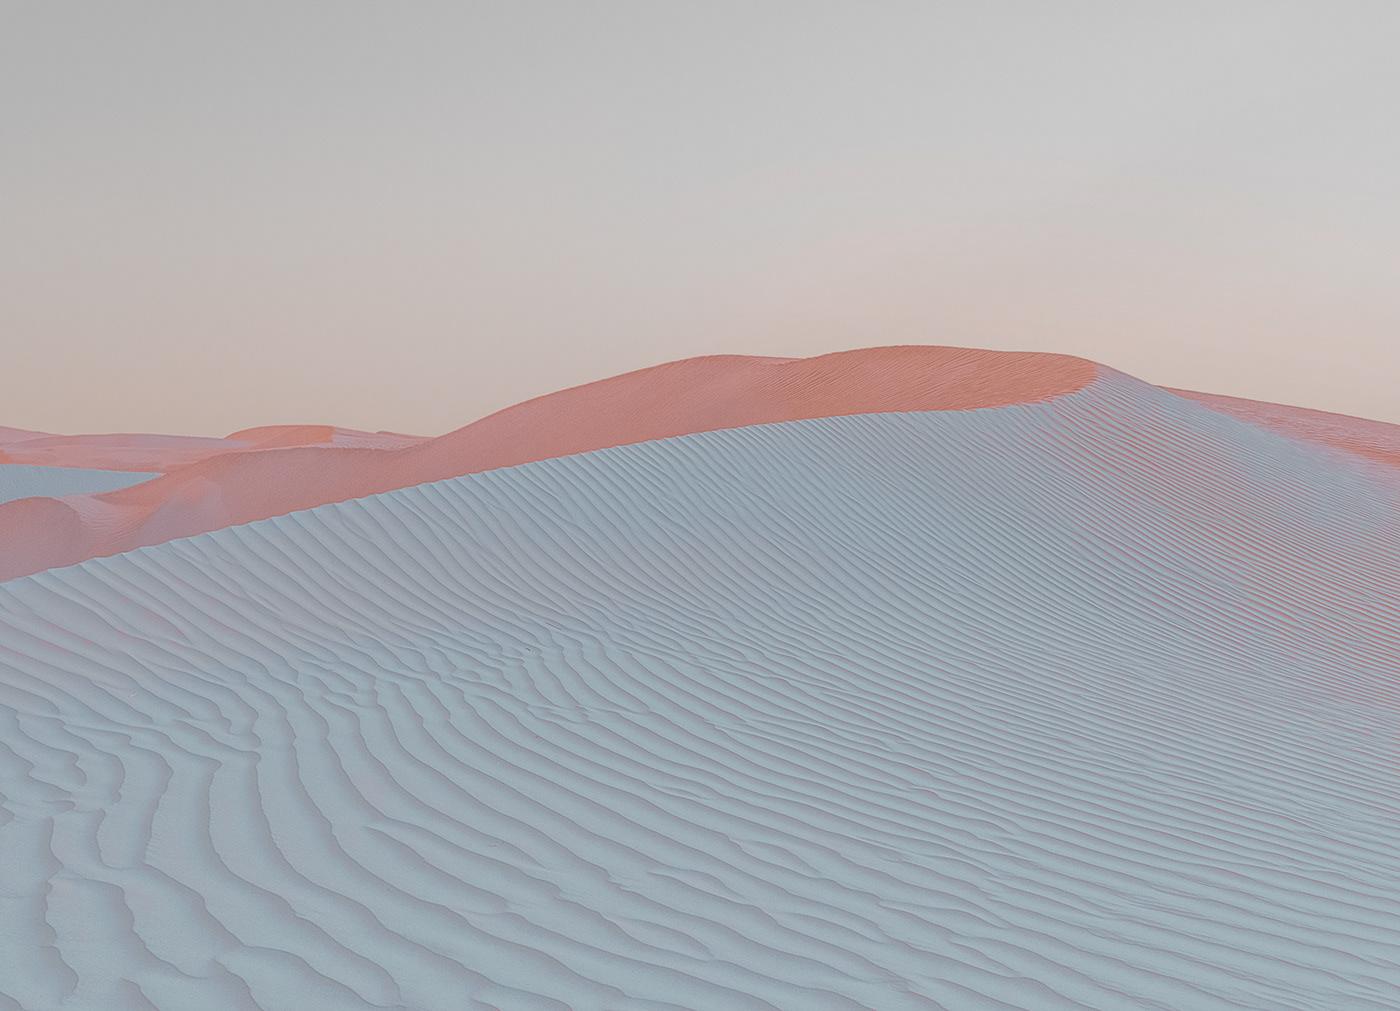 china desert Hotan Prefecture